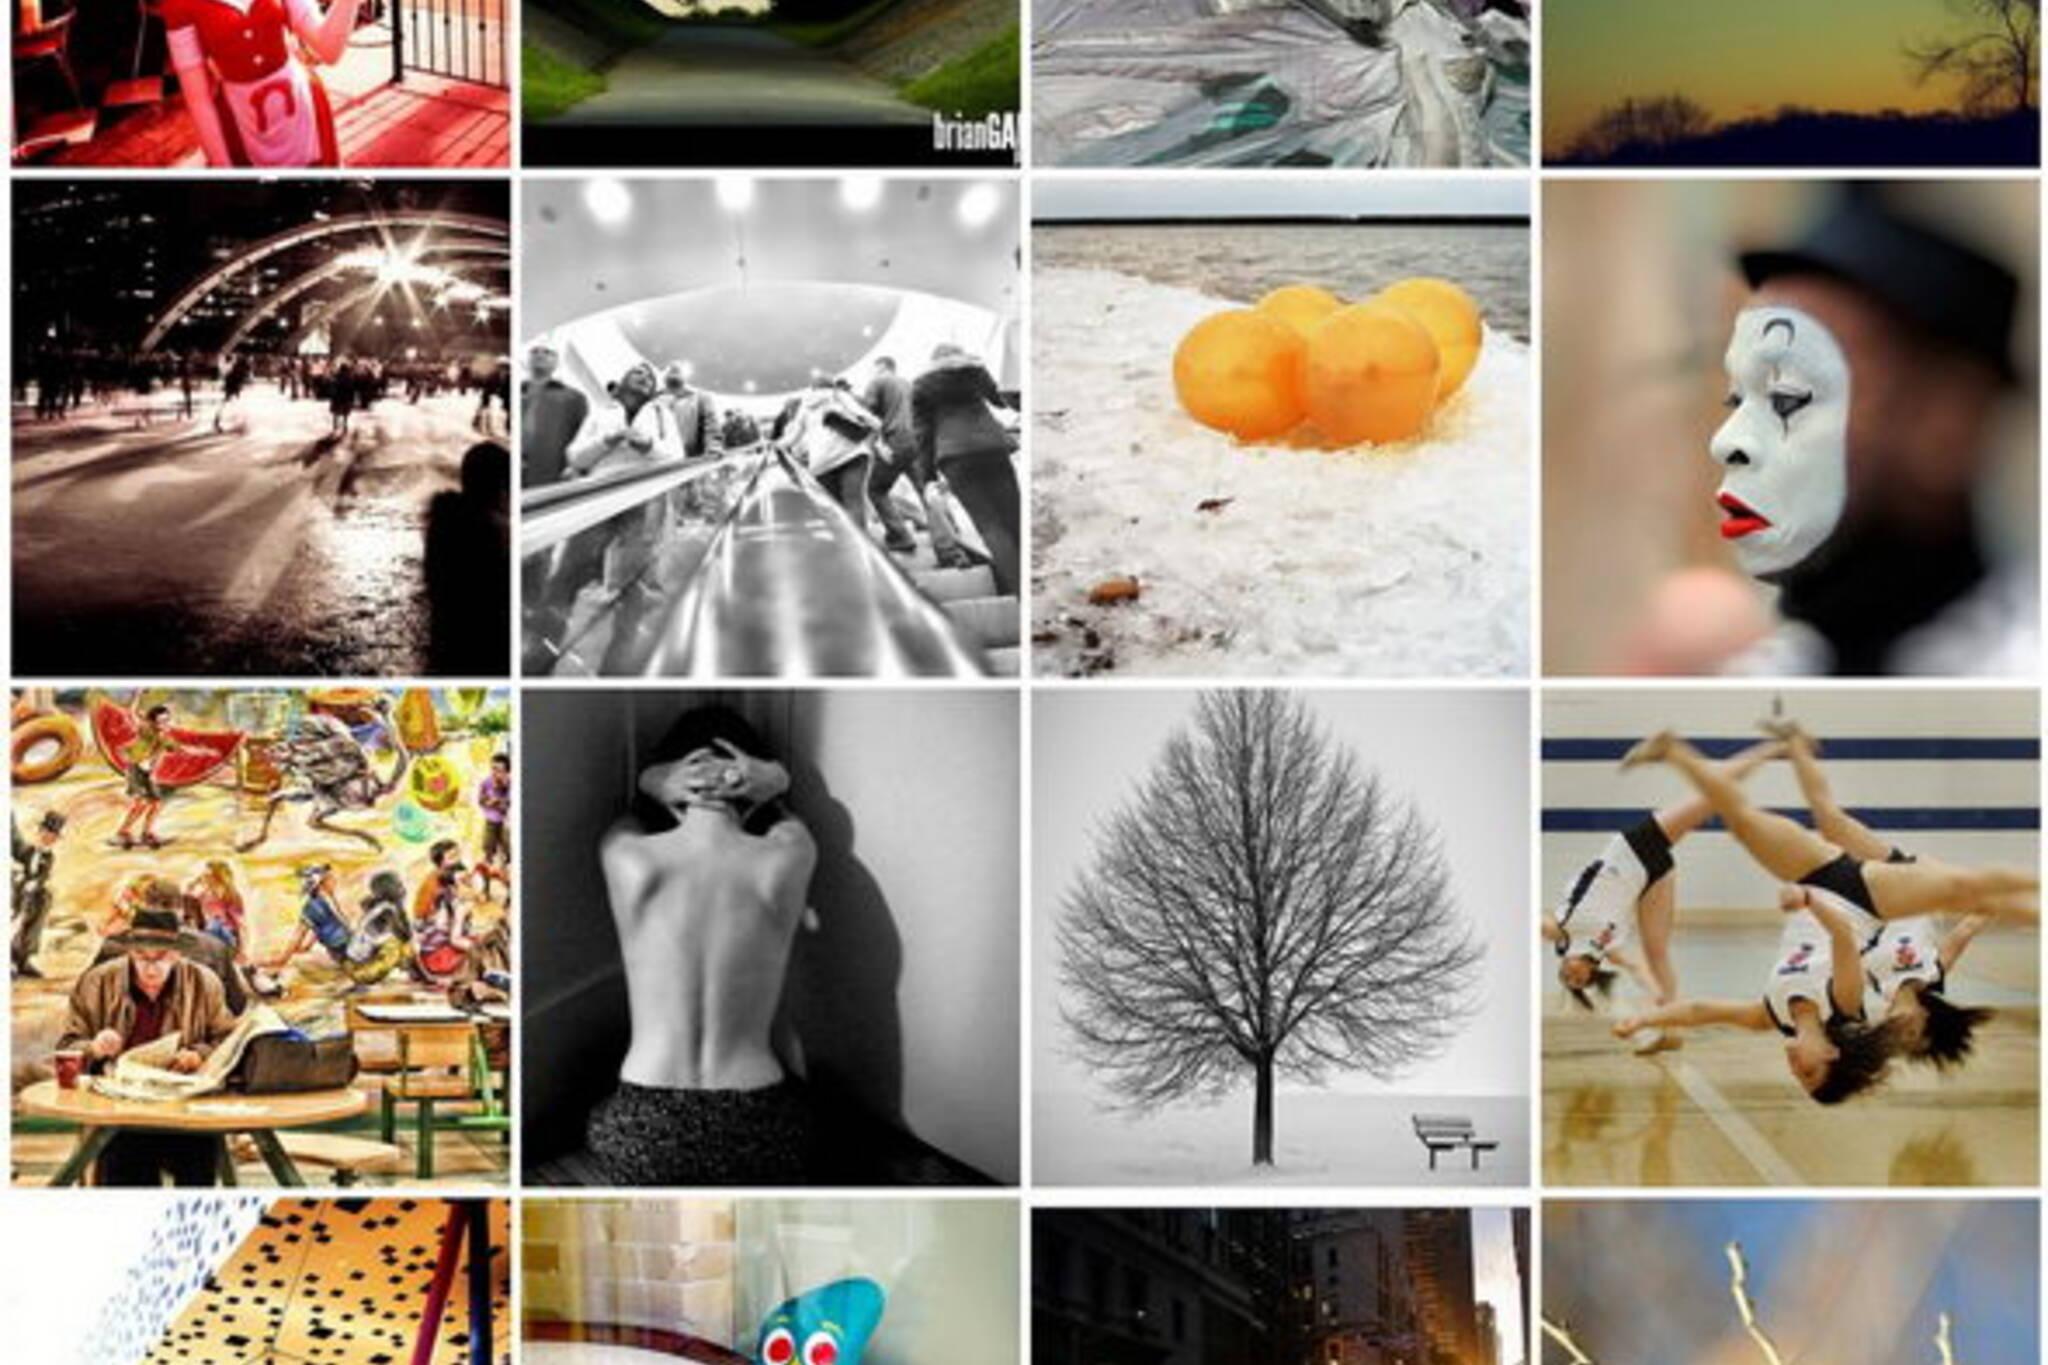 Flickr Forum - February 27th, 2009